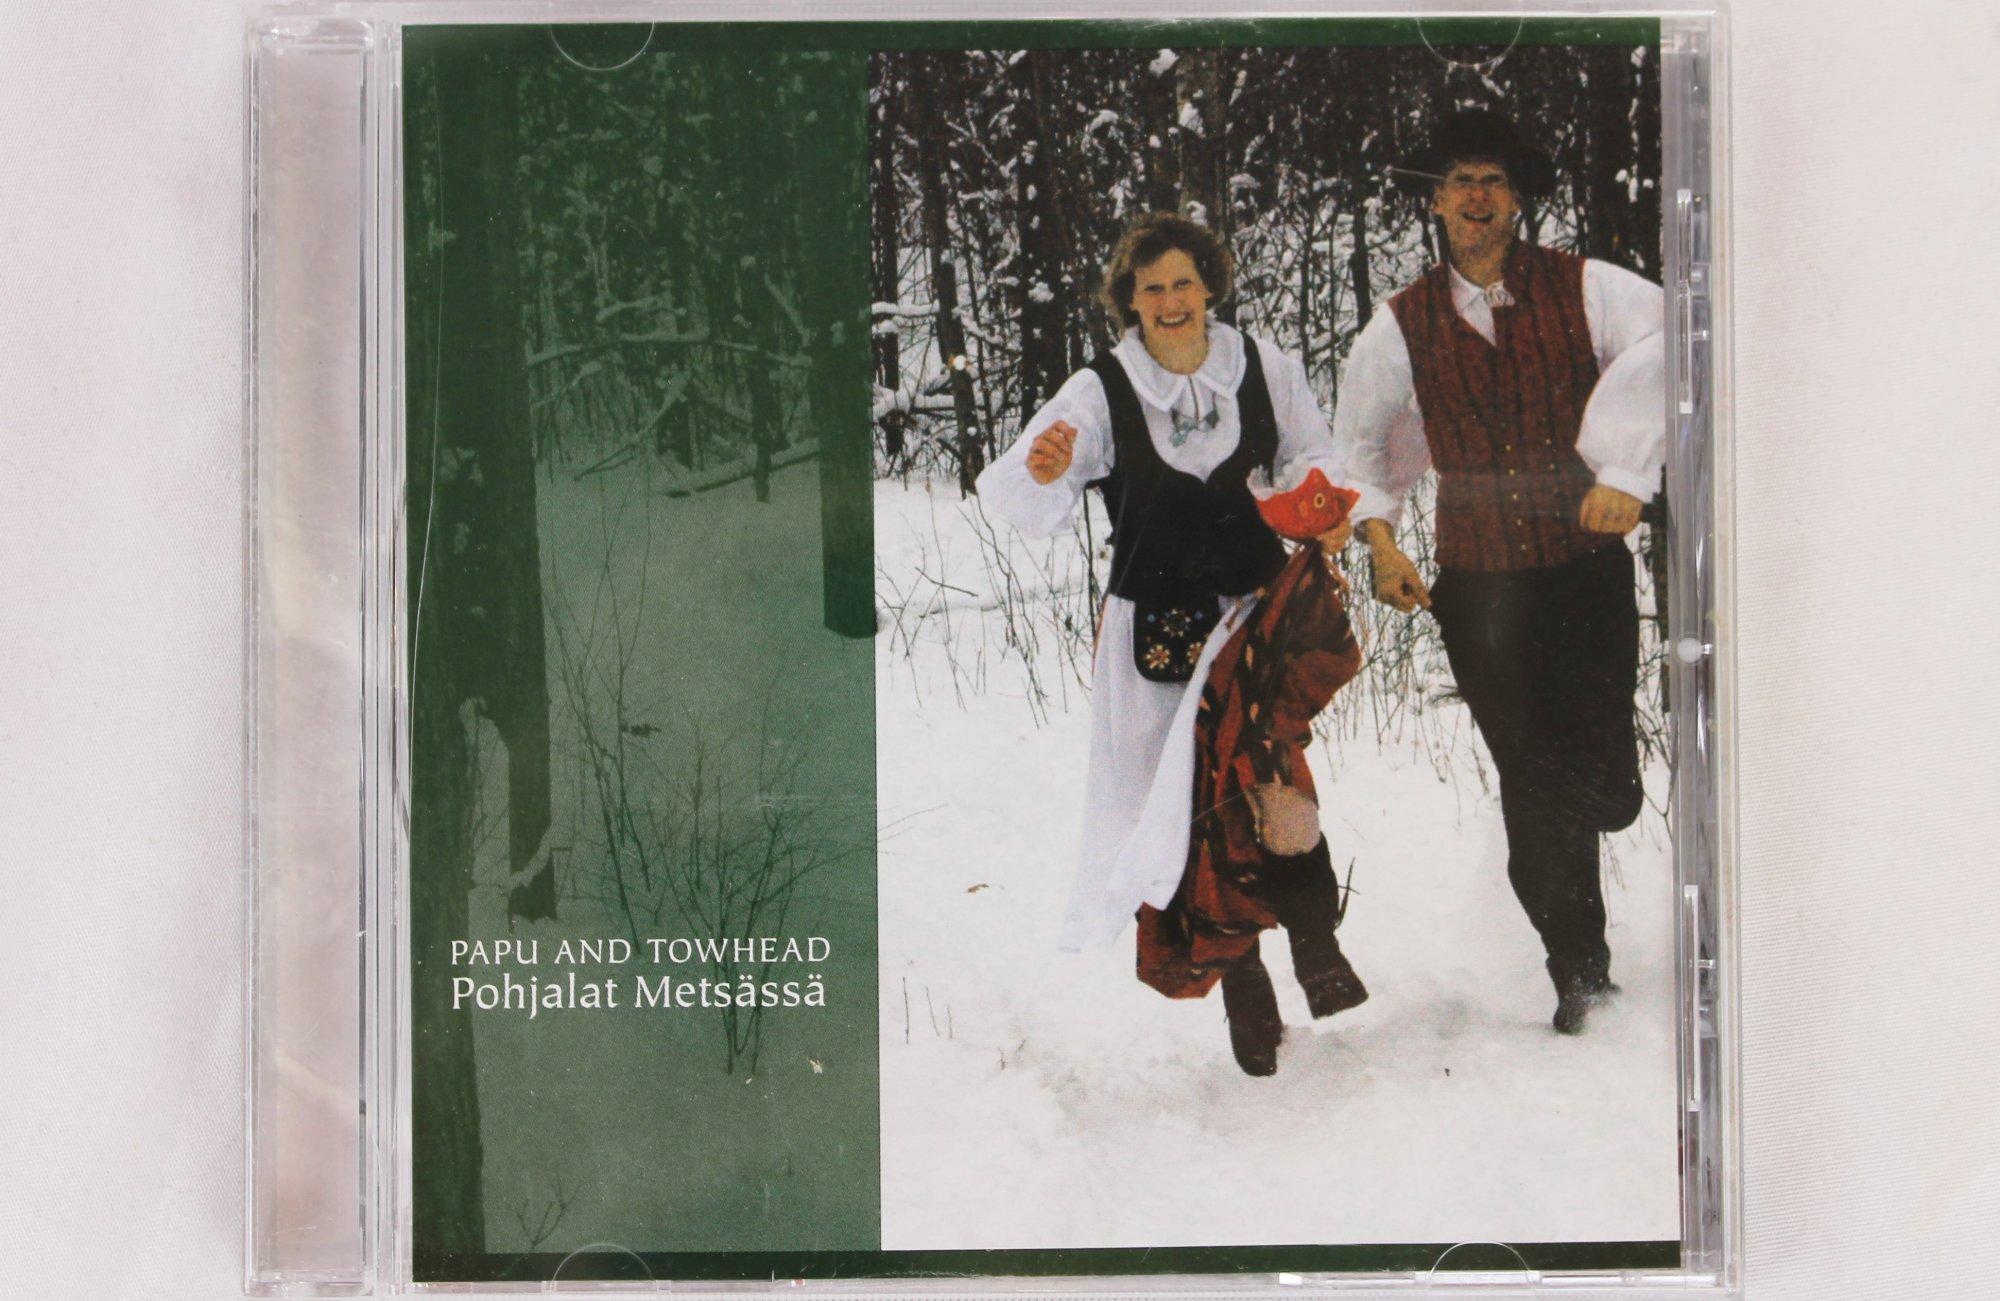 Papu and Towhead: Pohjalat Metsassa (CD)